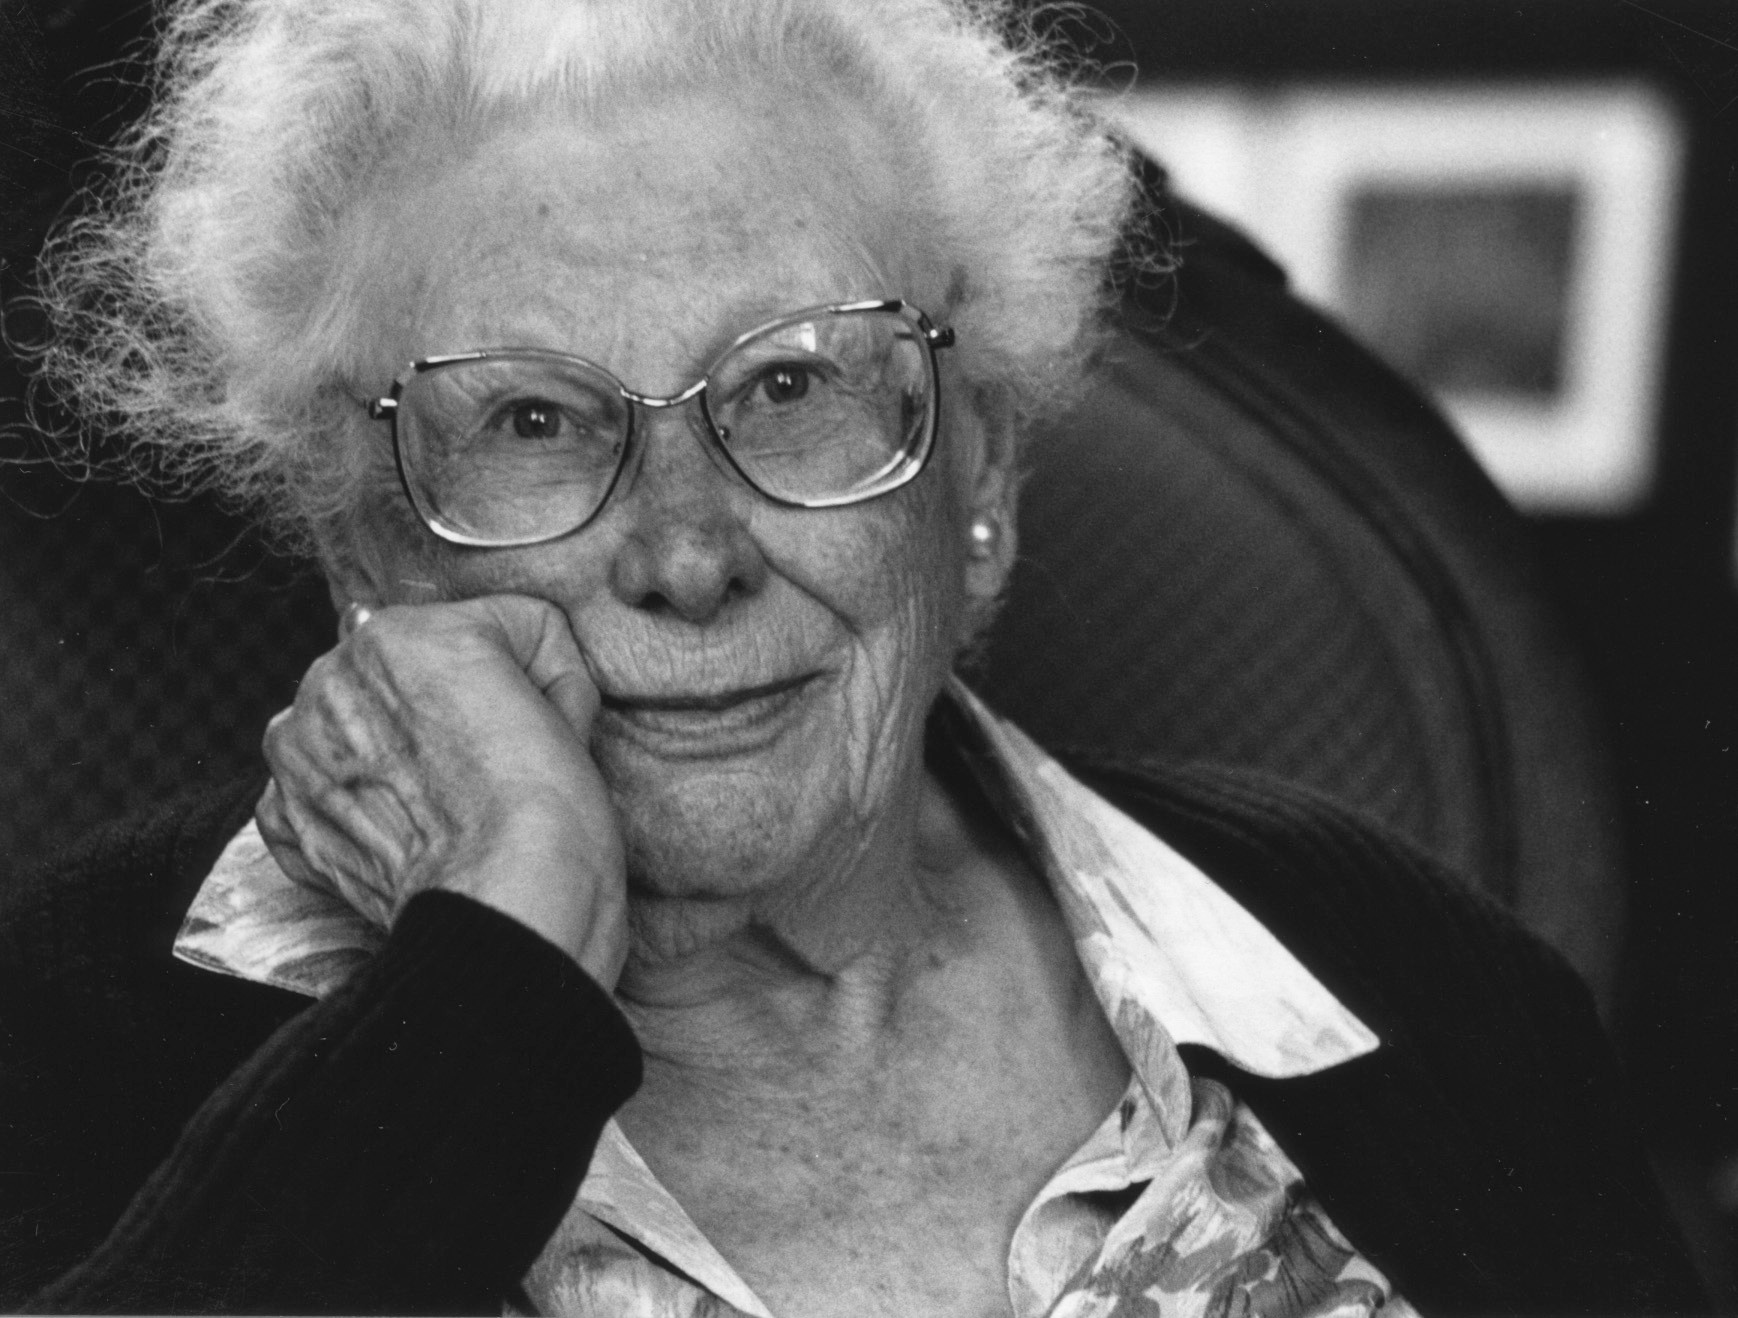 Virginia Adams, Ansel's Wife